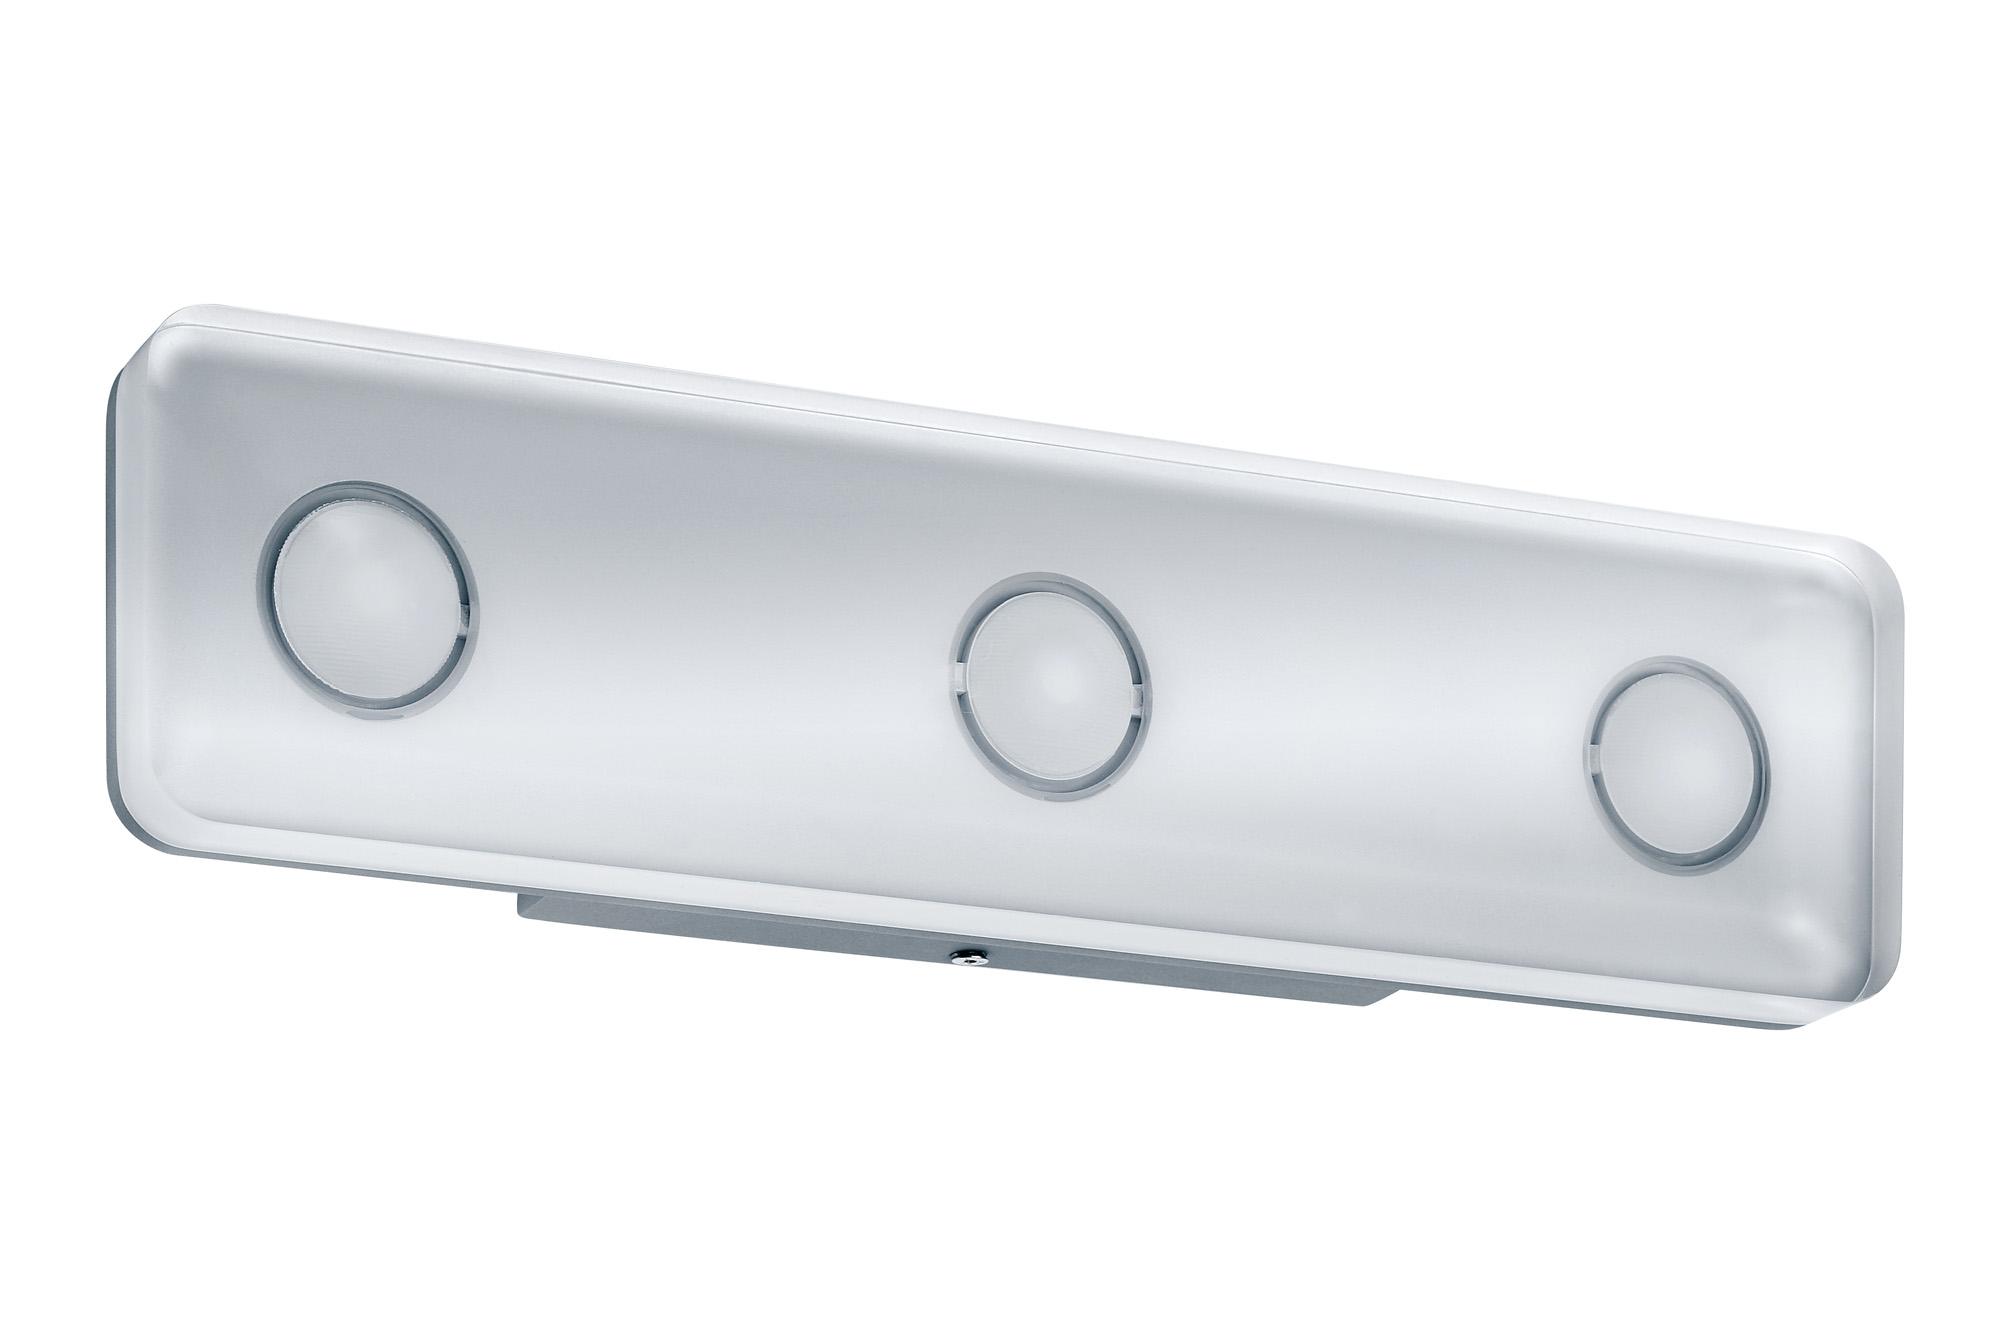 led wandleuchte theta eckig 13 5w aluminium klar 70479. Black Bedroom Furniture Sets. Home Design Ideas